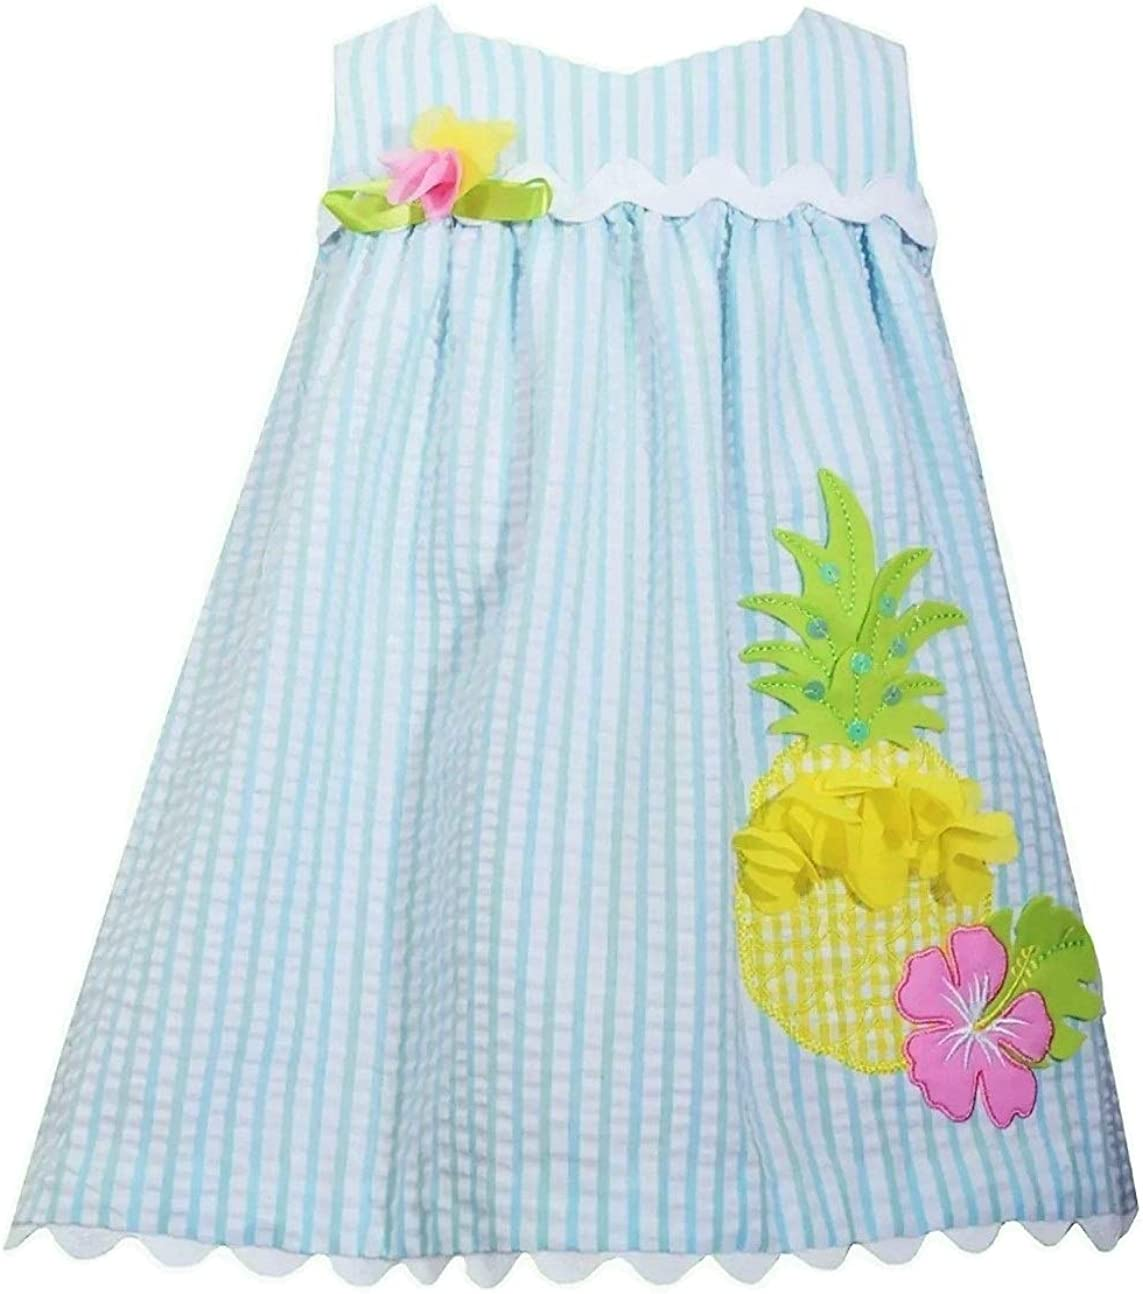 Bonnie Jean Girls' Seersucker Pineapple Sundress 4-6X